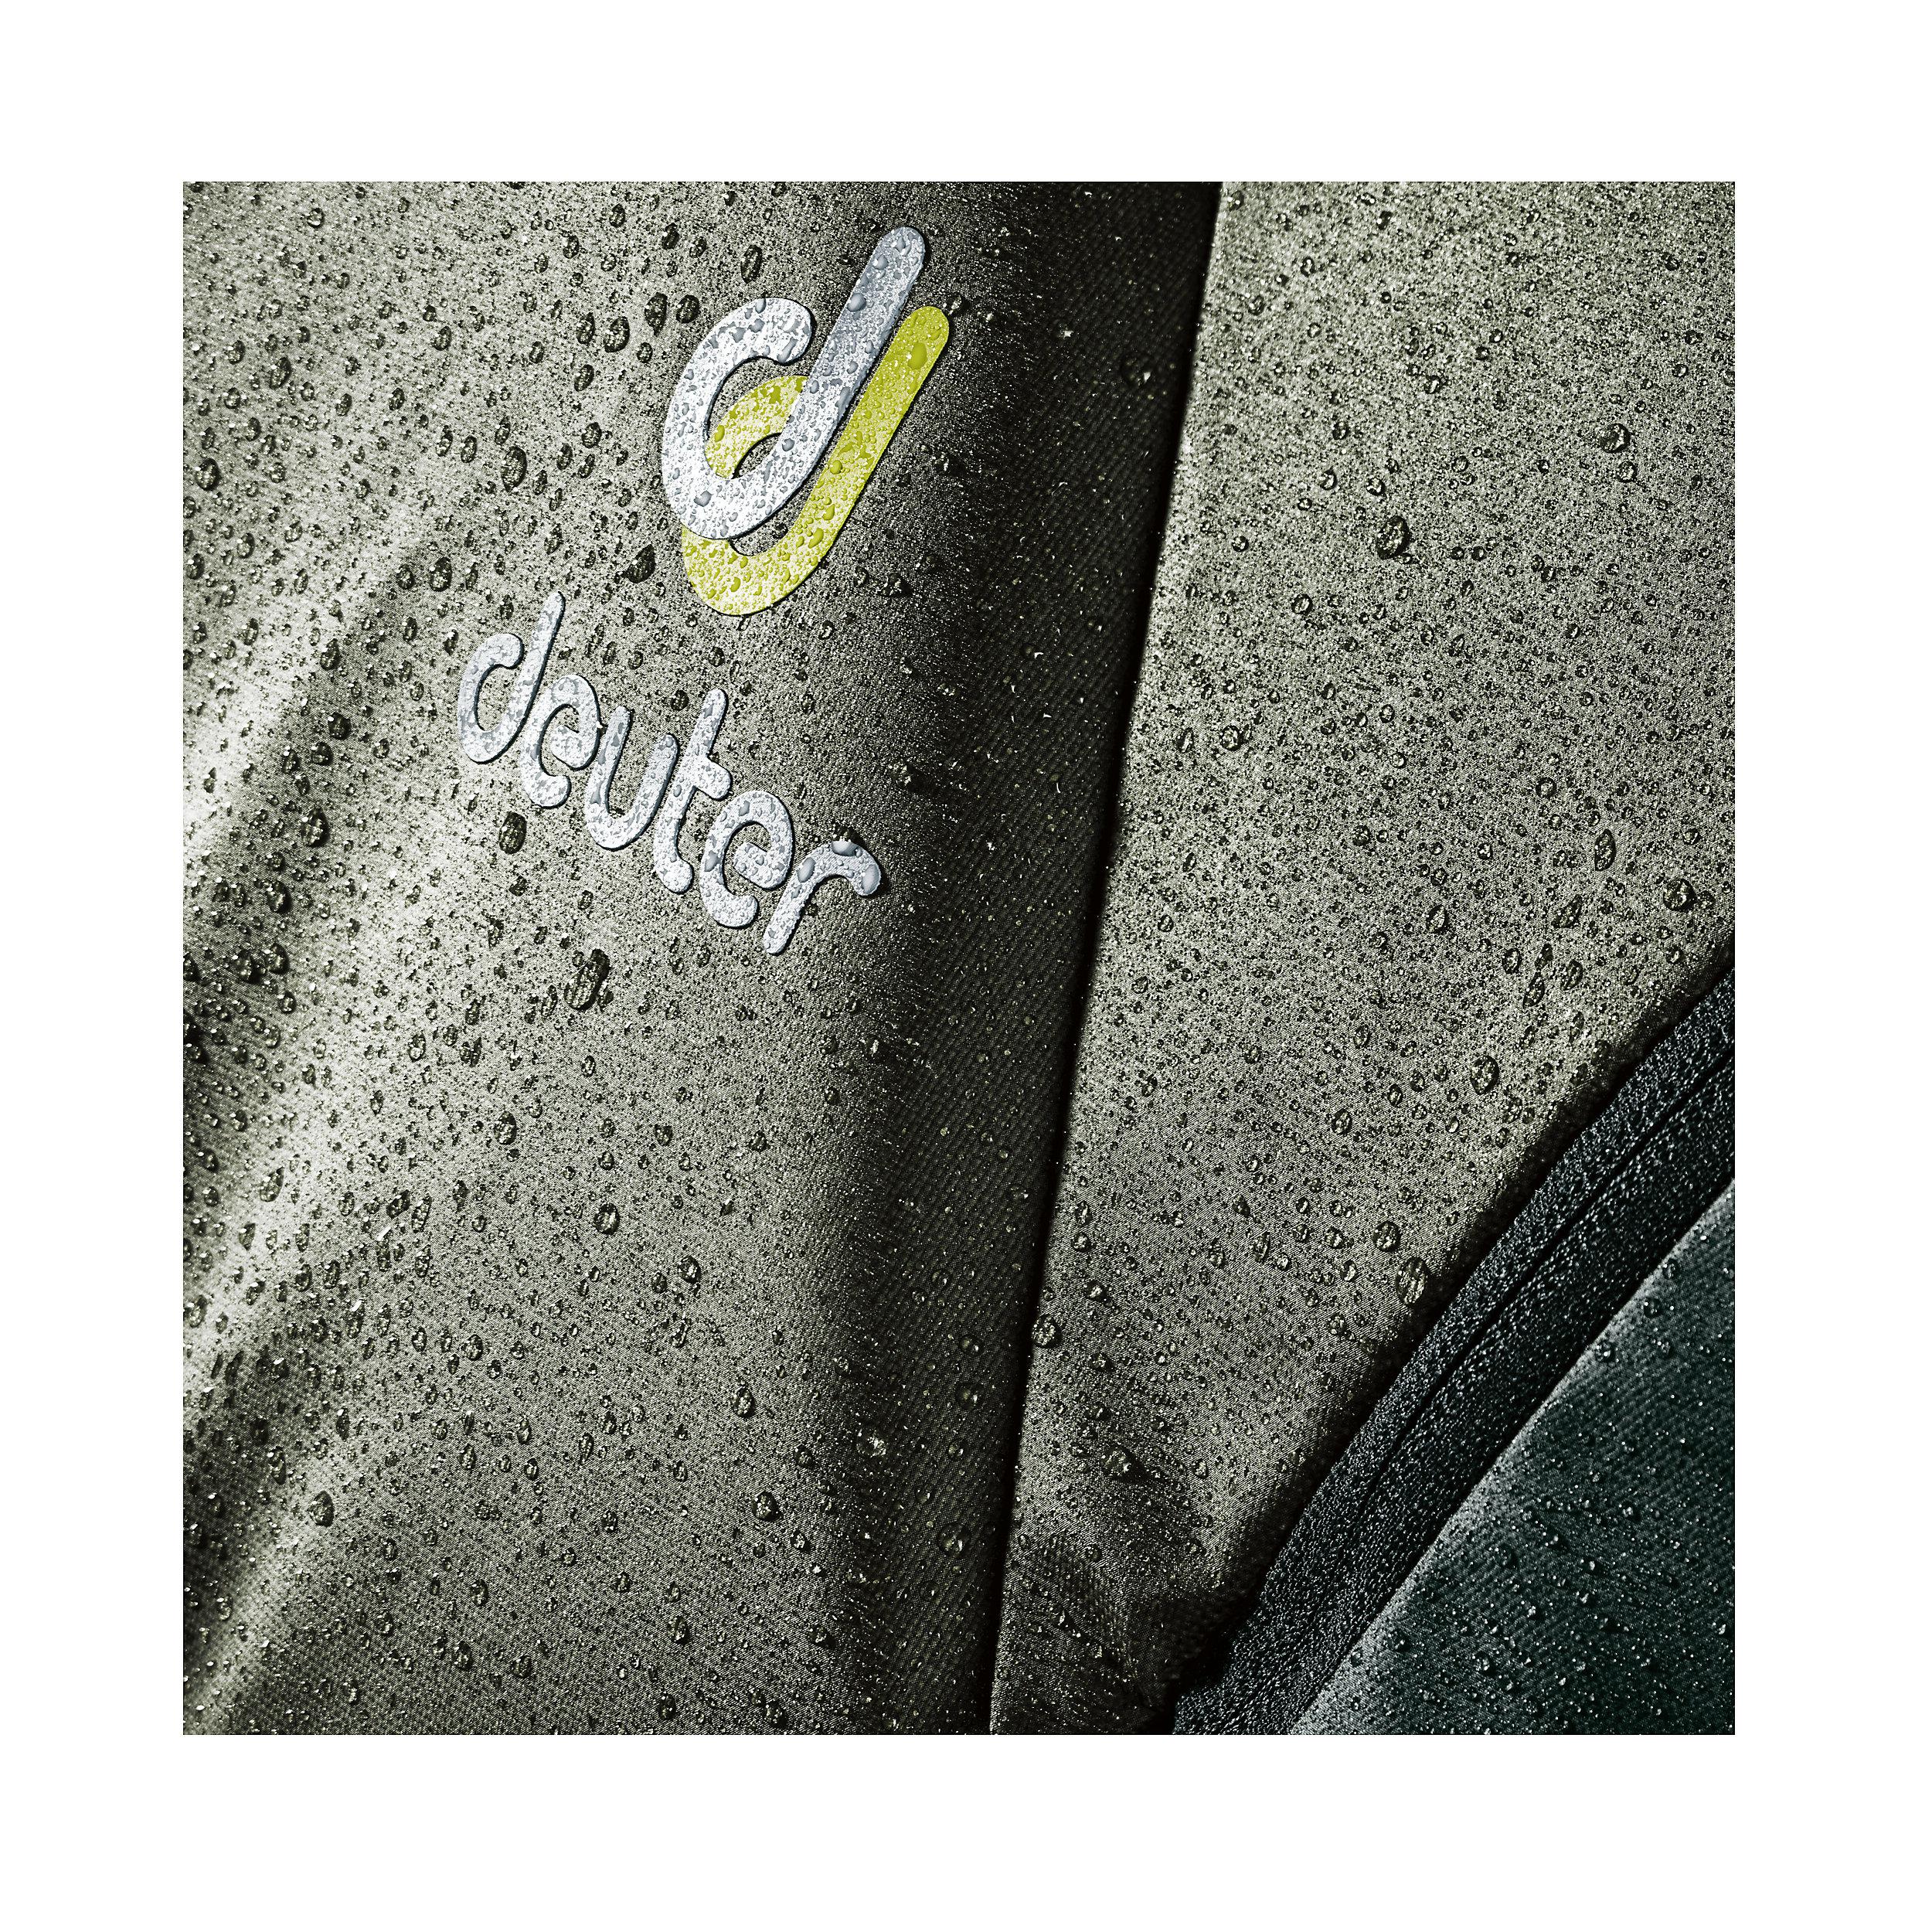 Reisetasche AViANT Duffel Pro 40 AViANT Series